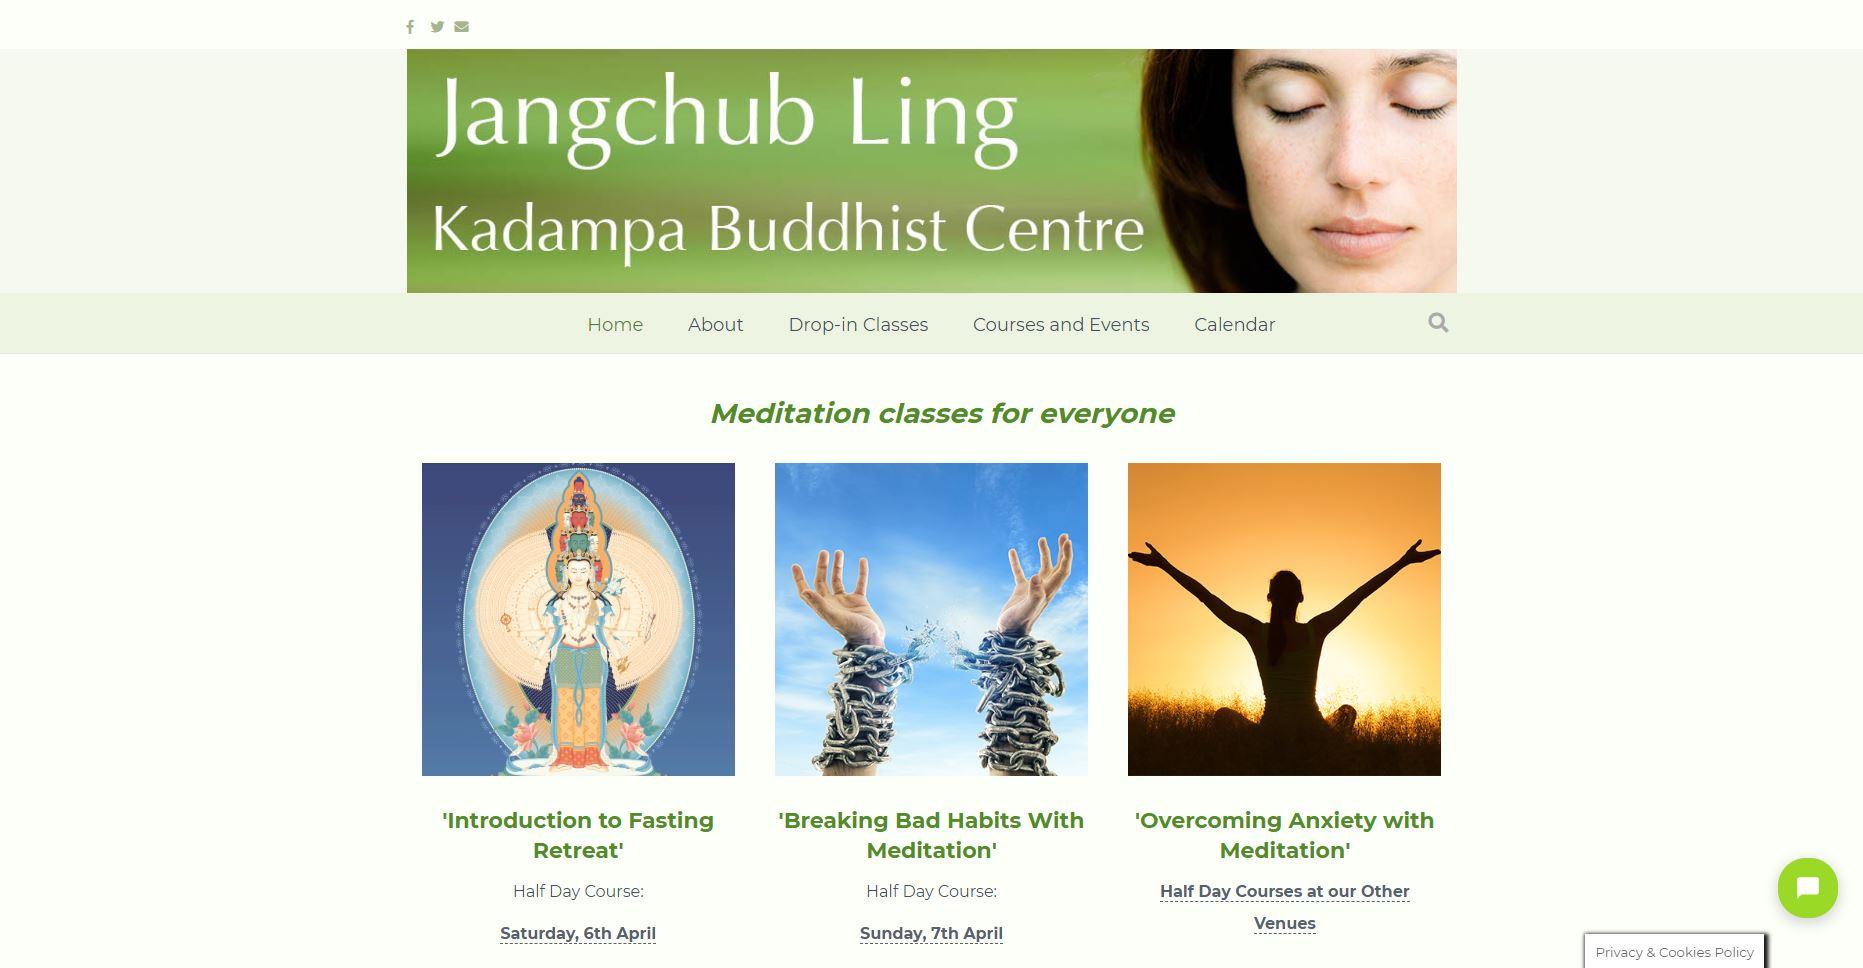 Jangchub Ling Buddhist Centre